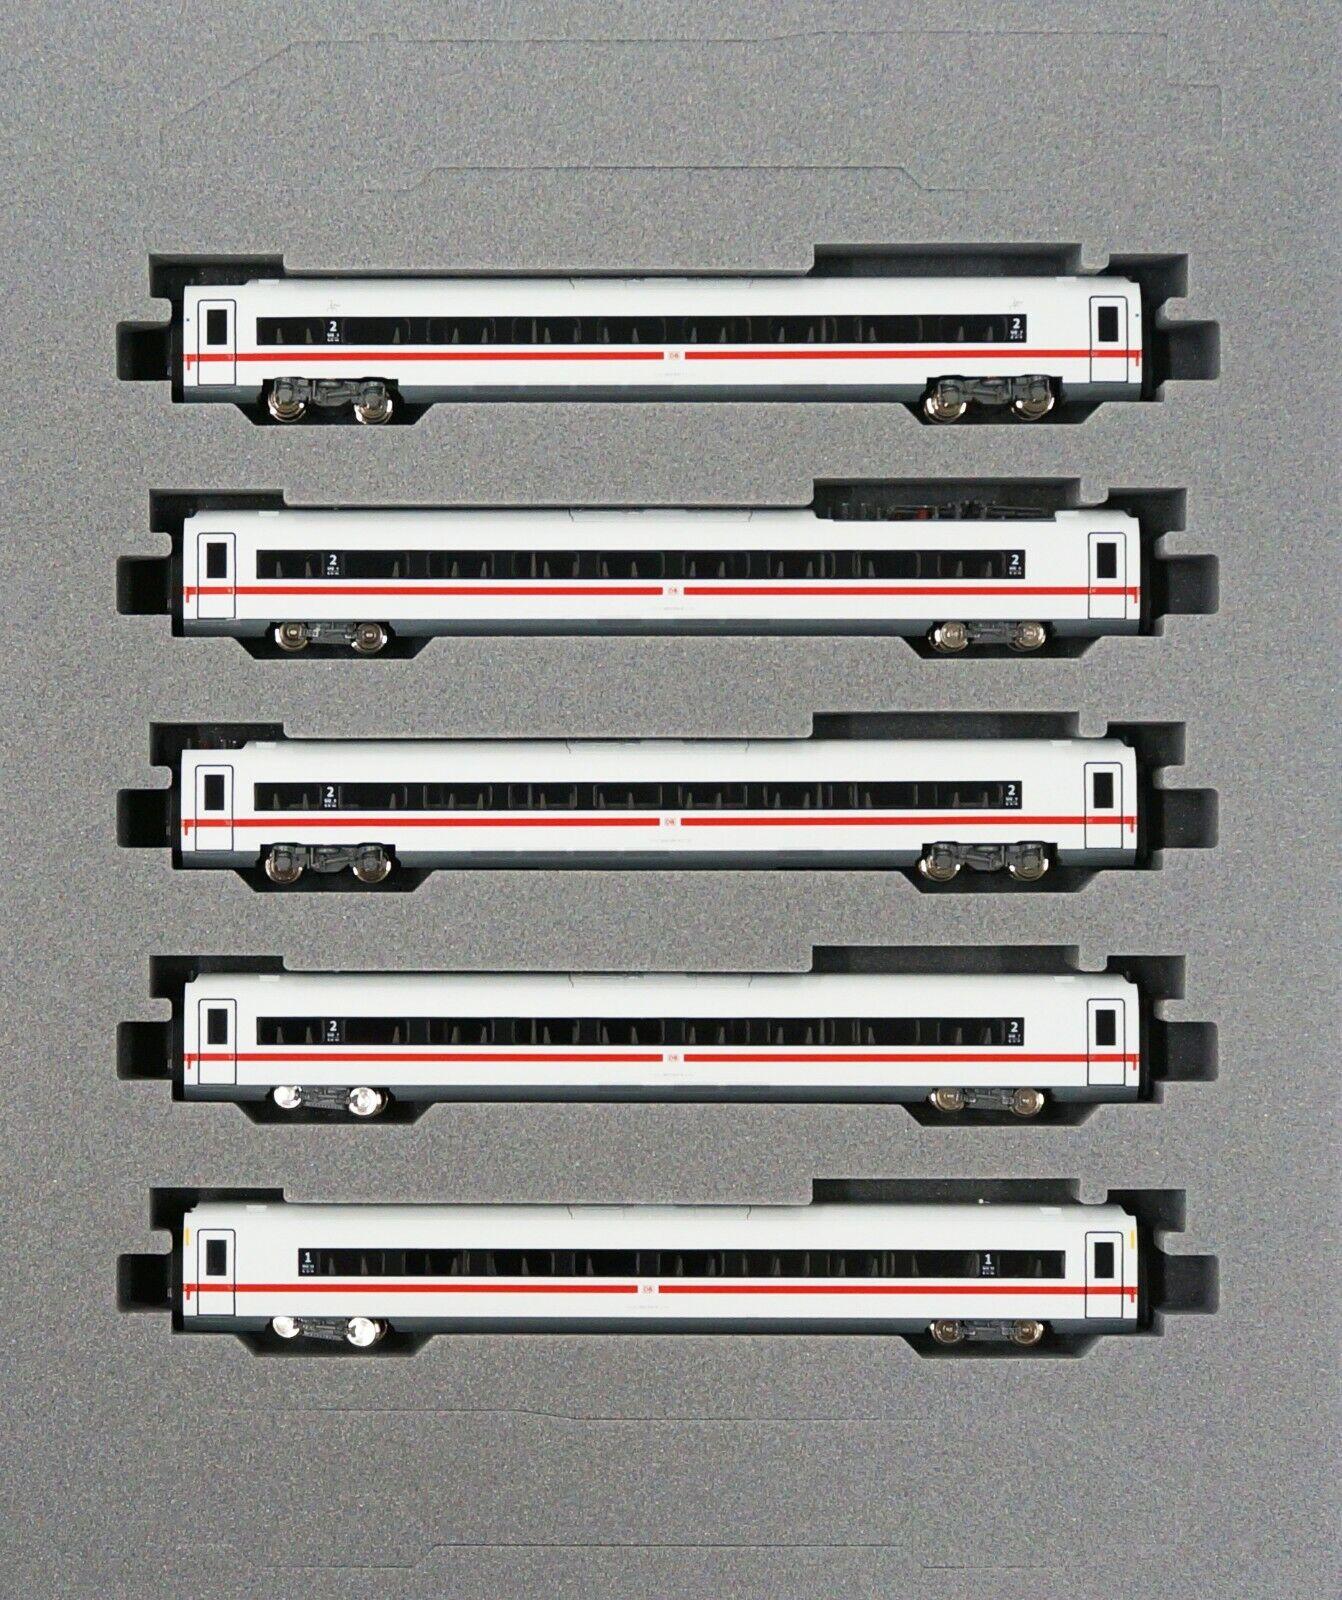 Kato 10-1513 DB ICE4 ( Inter City Express) Hielo 5 Cars Set (N Escala)